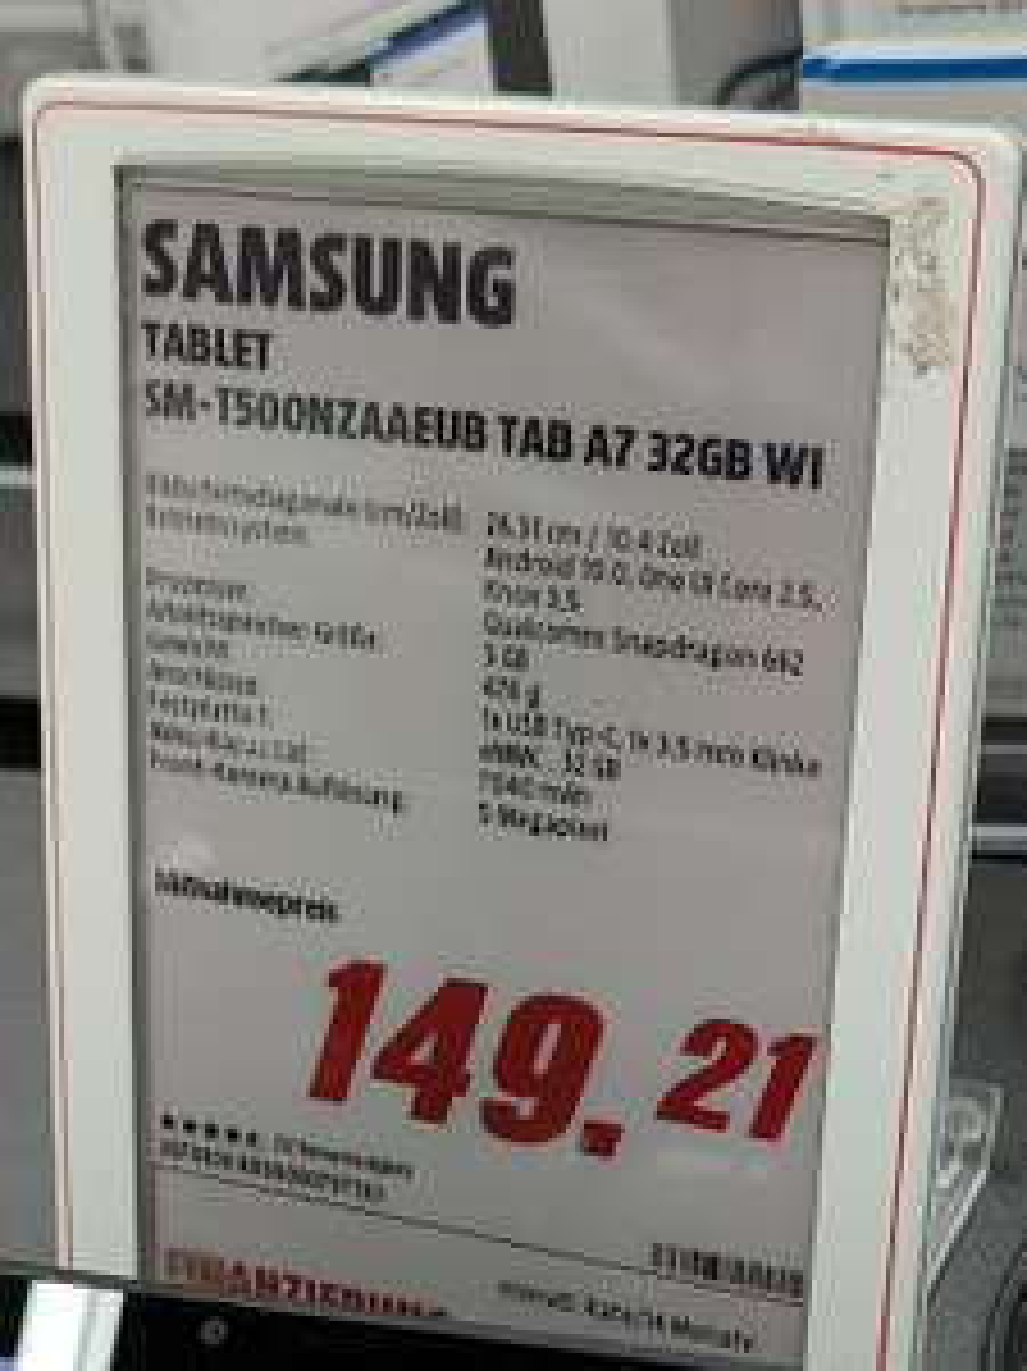 LOKAL Dortmund (Indupark) SAMSUNG TAB A7 Wi-Fi, Tablet, 32 GB, 3 GB RAM, 10.4 Zoll, Android 10.0,